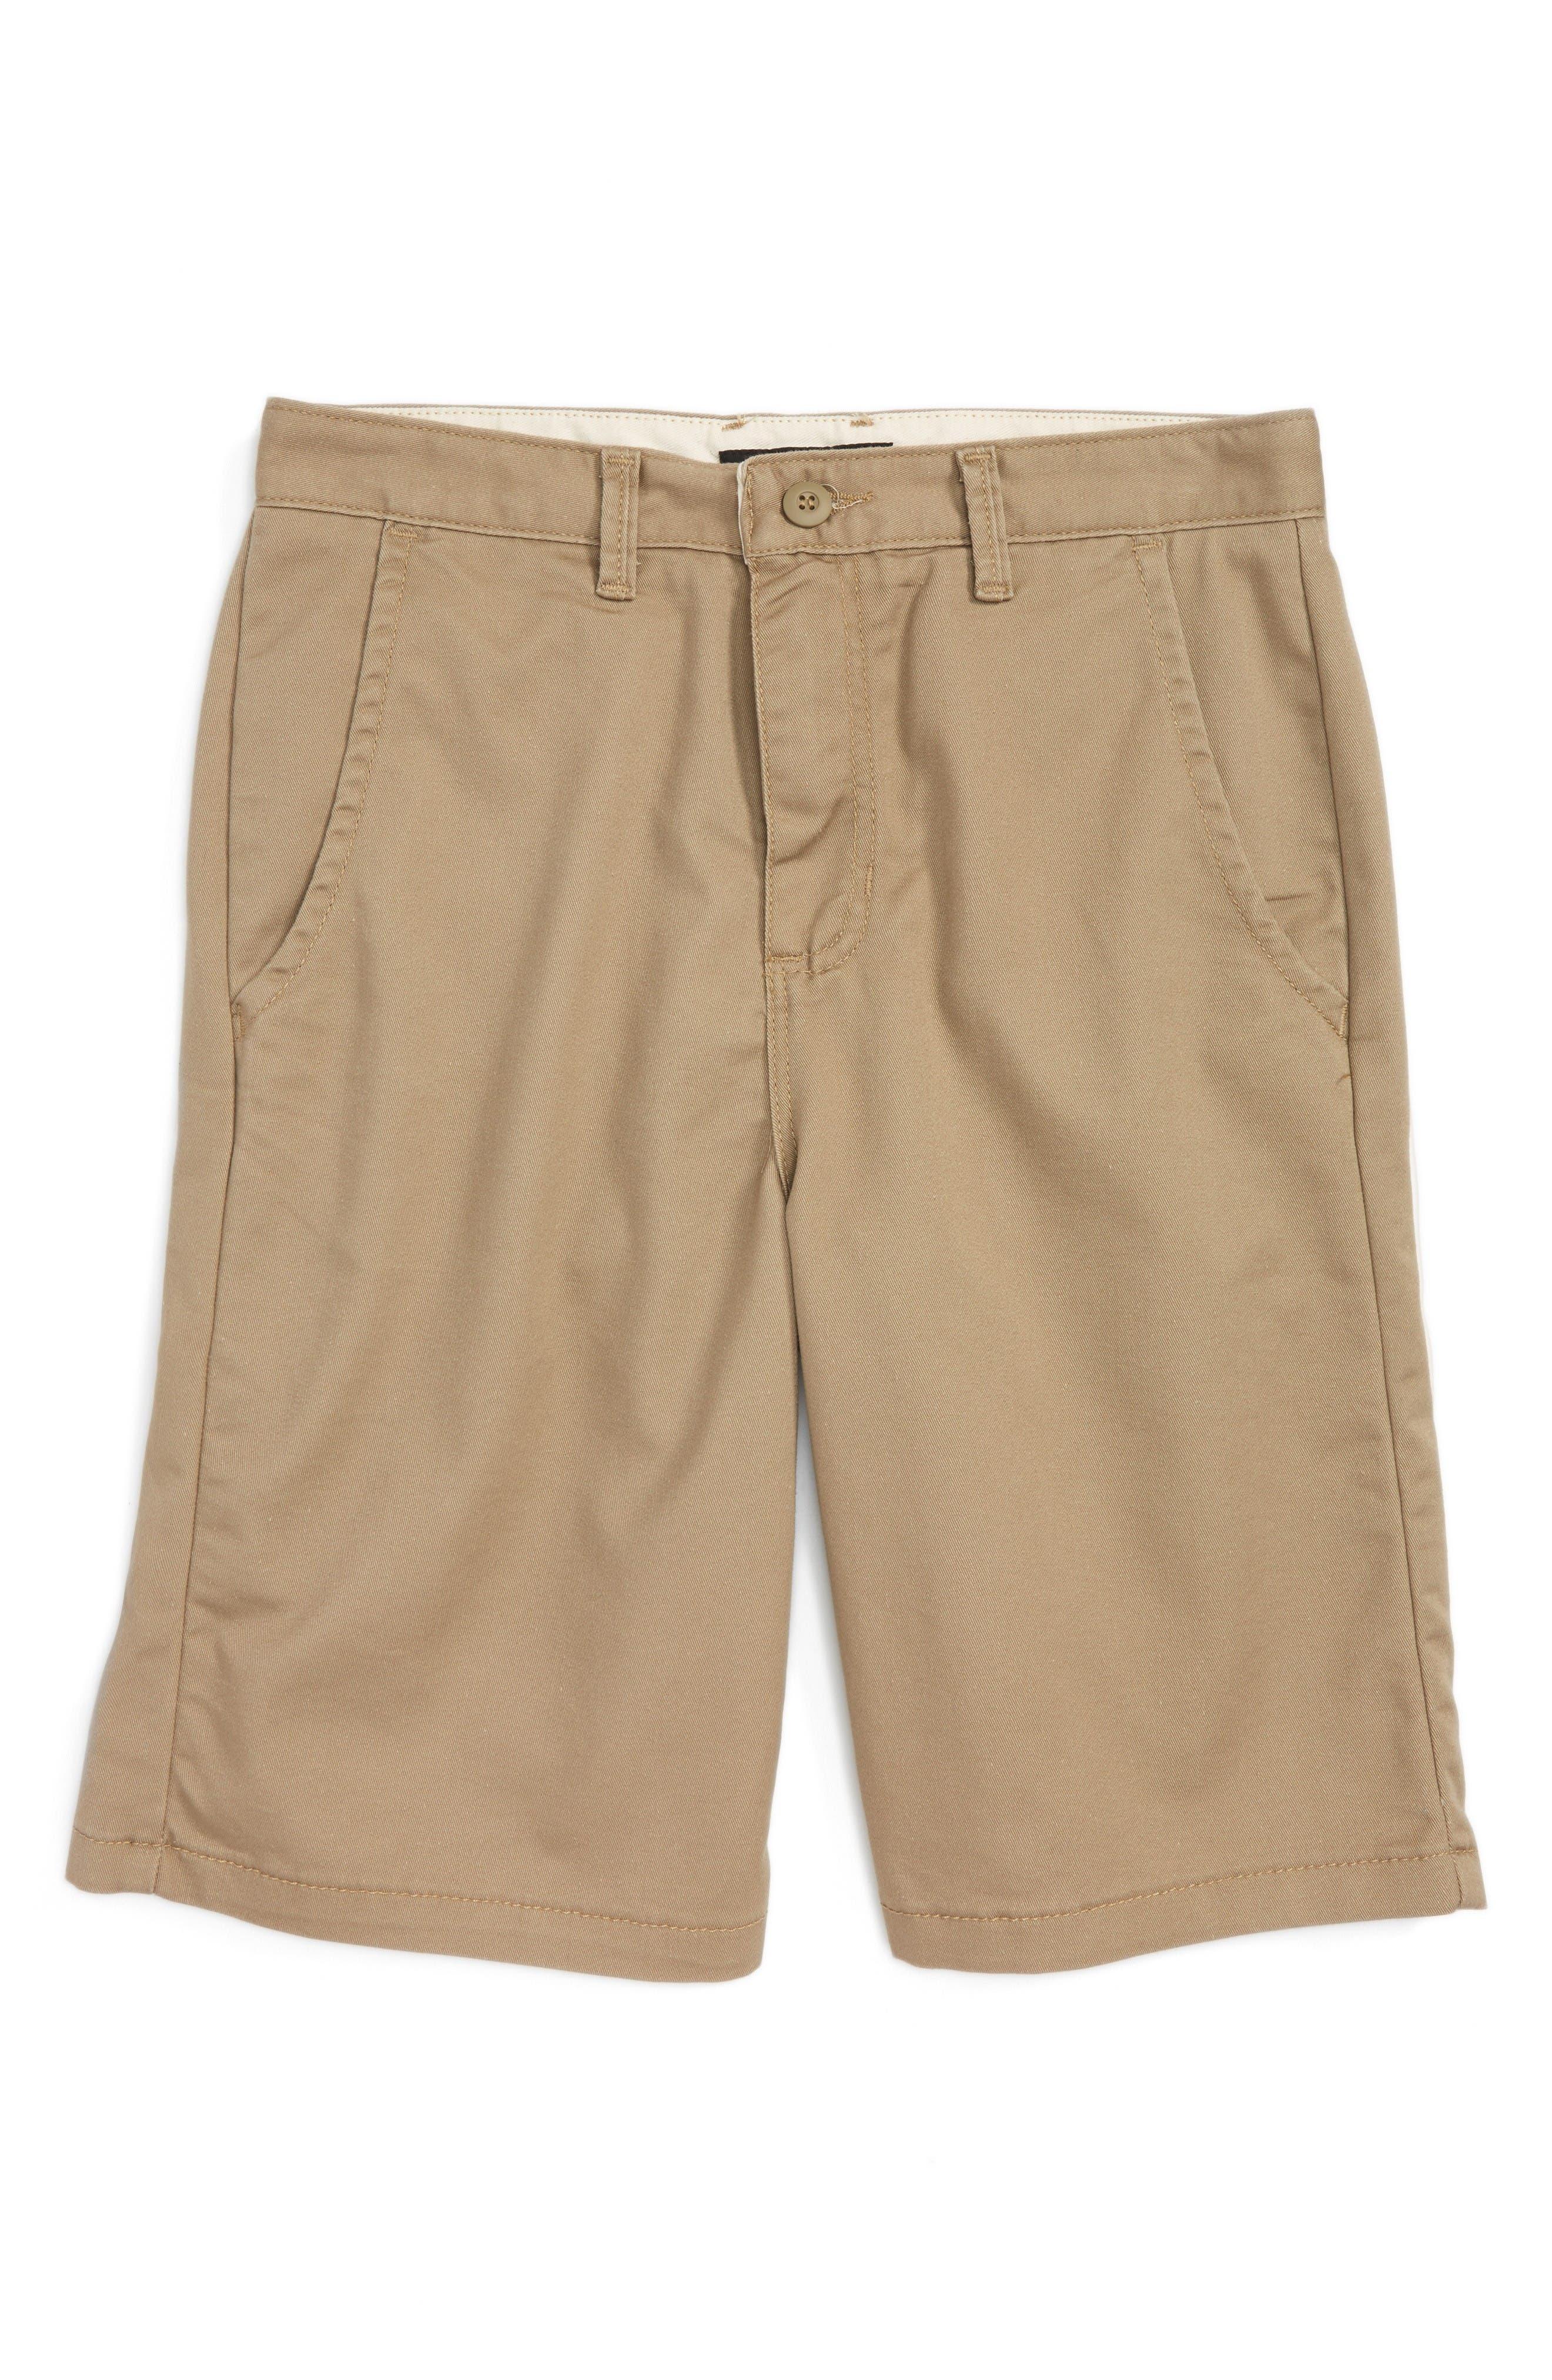 Authentic Walk Shorts,                         Main,                         color, Military Khaki